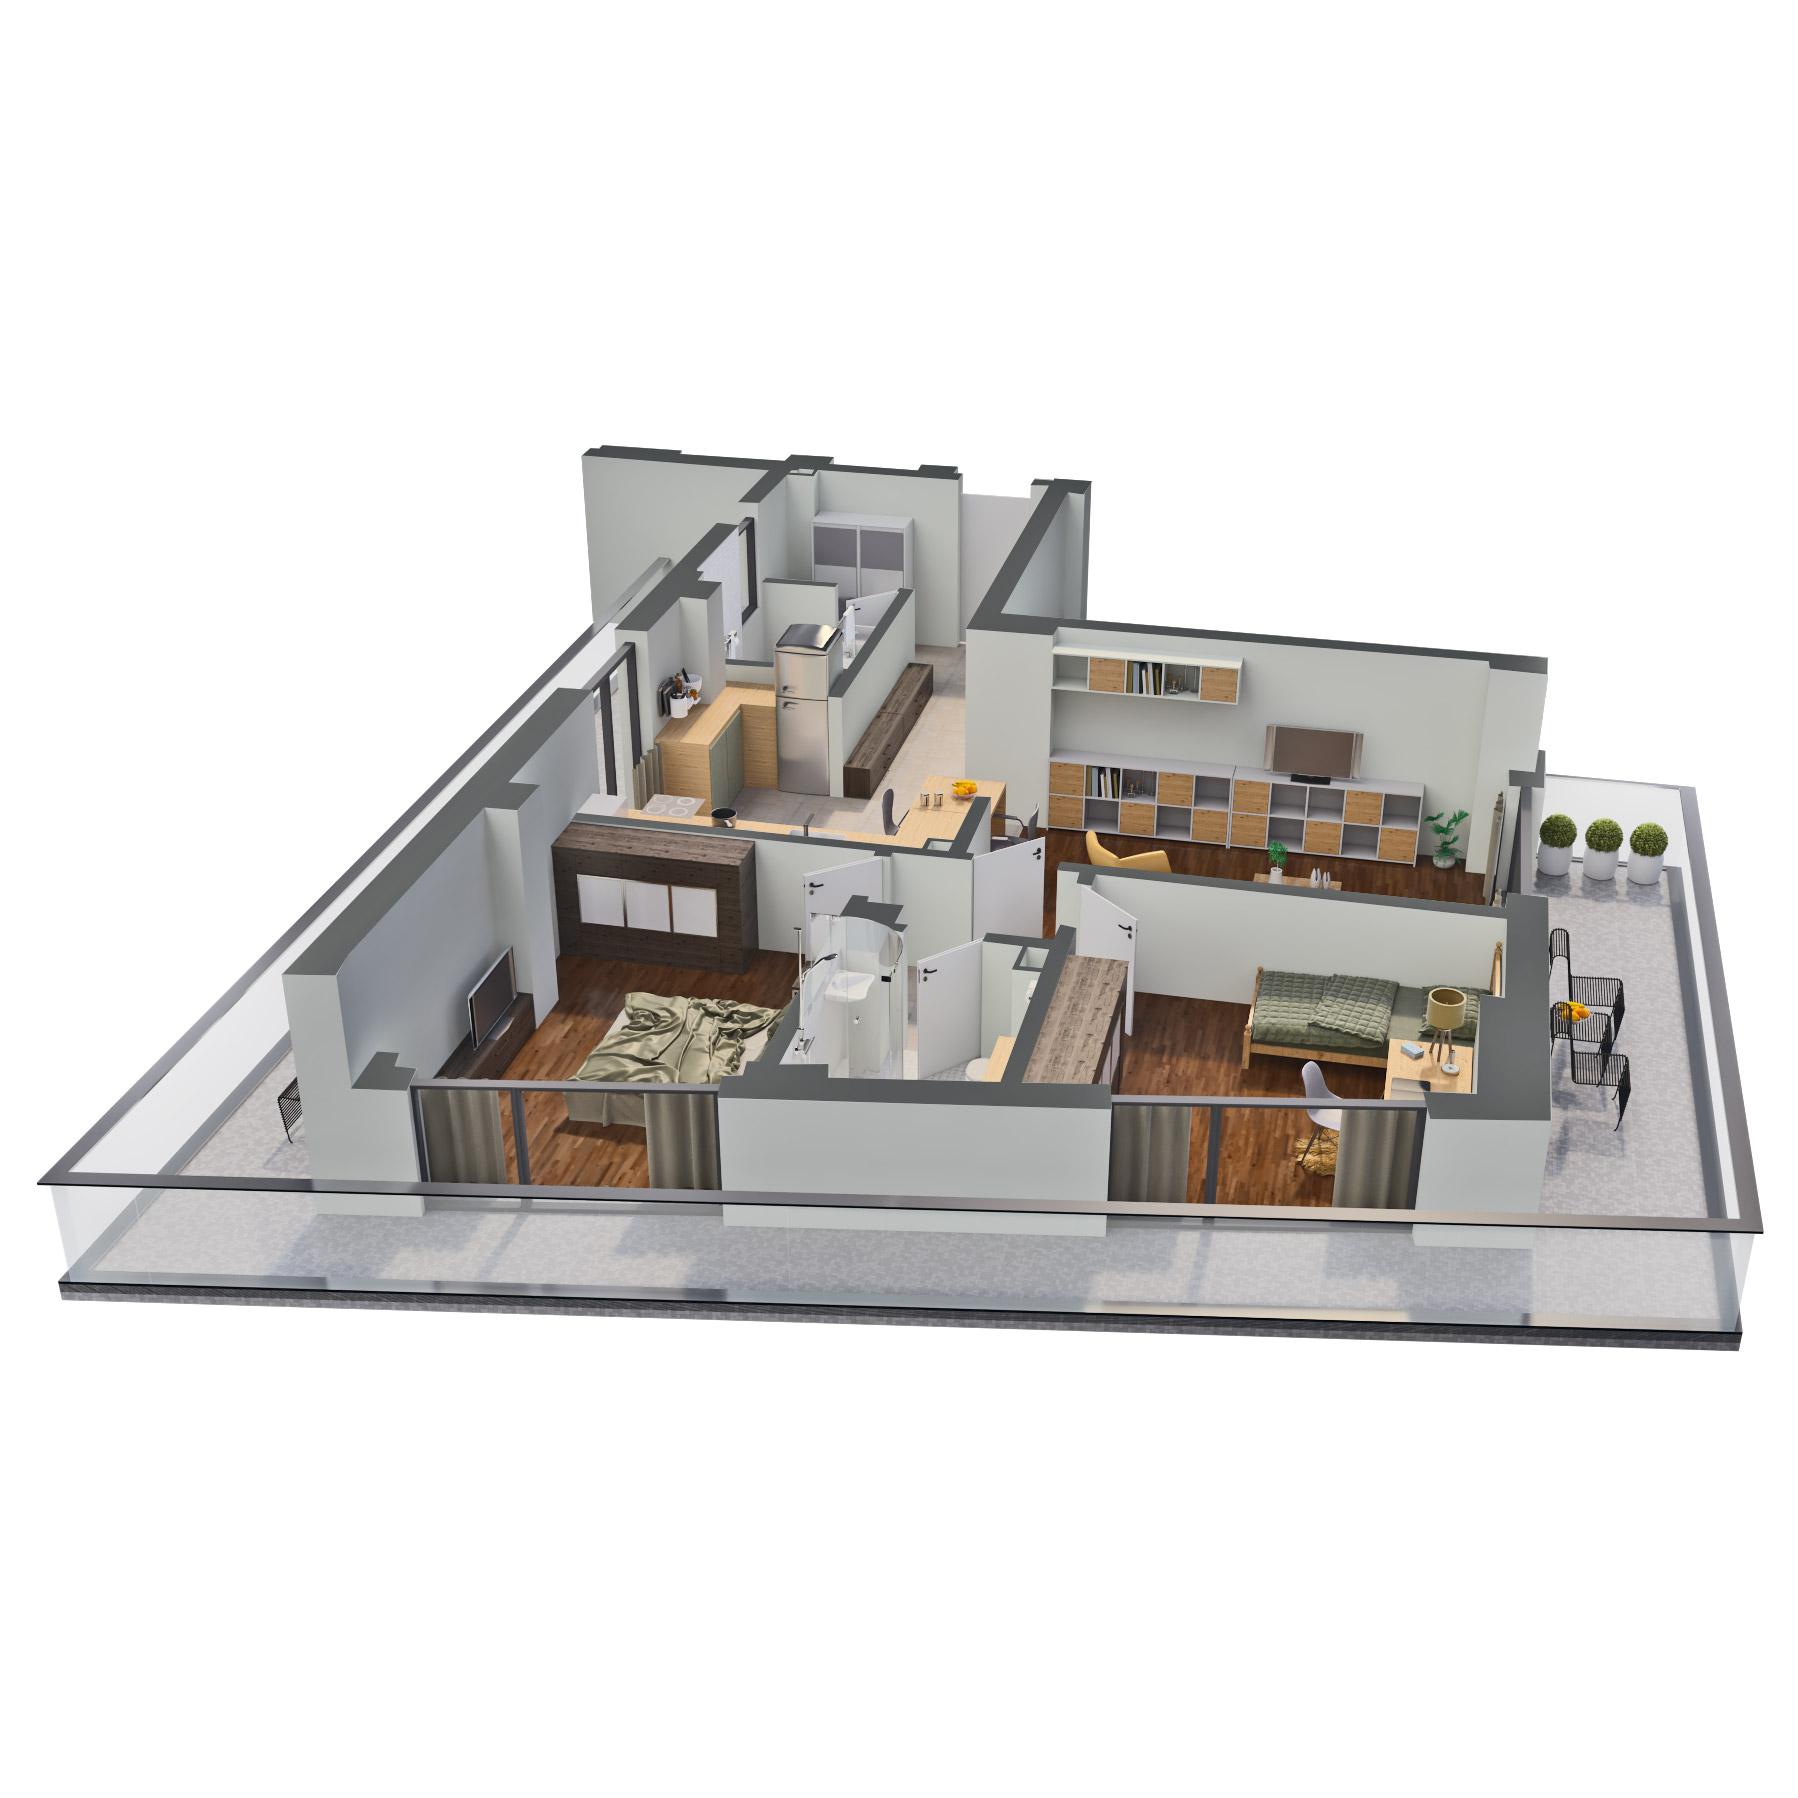 Apartament 3 camere de vanzare Bucuresti - Catedral Residence - Marriott, Piata Unirii, 13 Septembrie, Izvor - Tip 1 - T1 - C